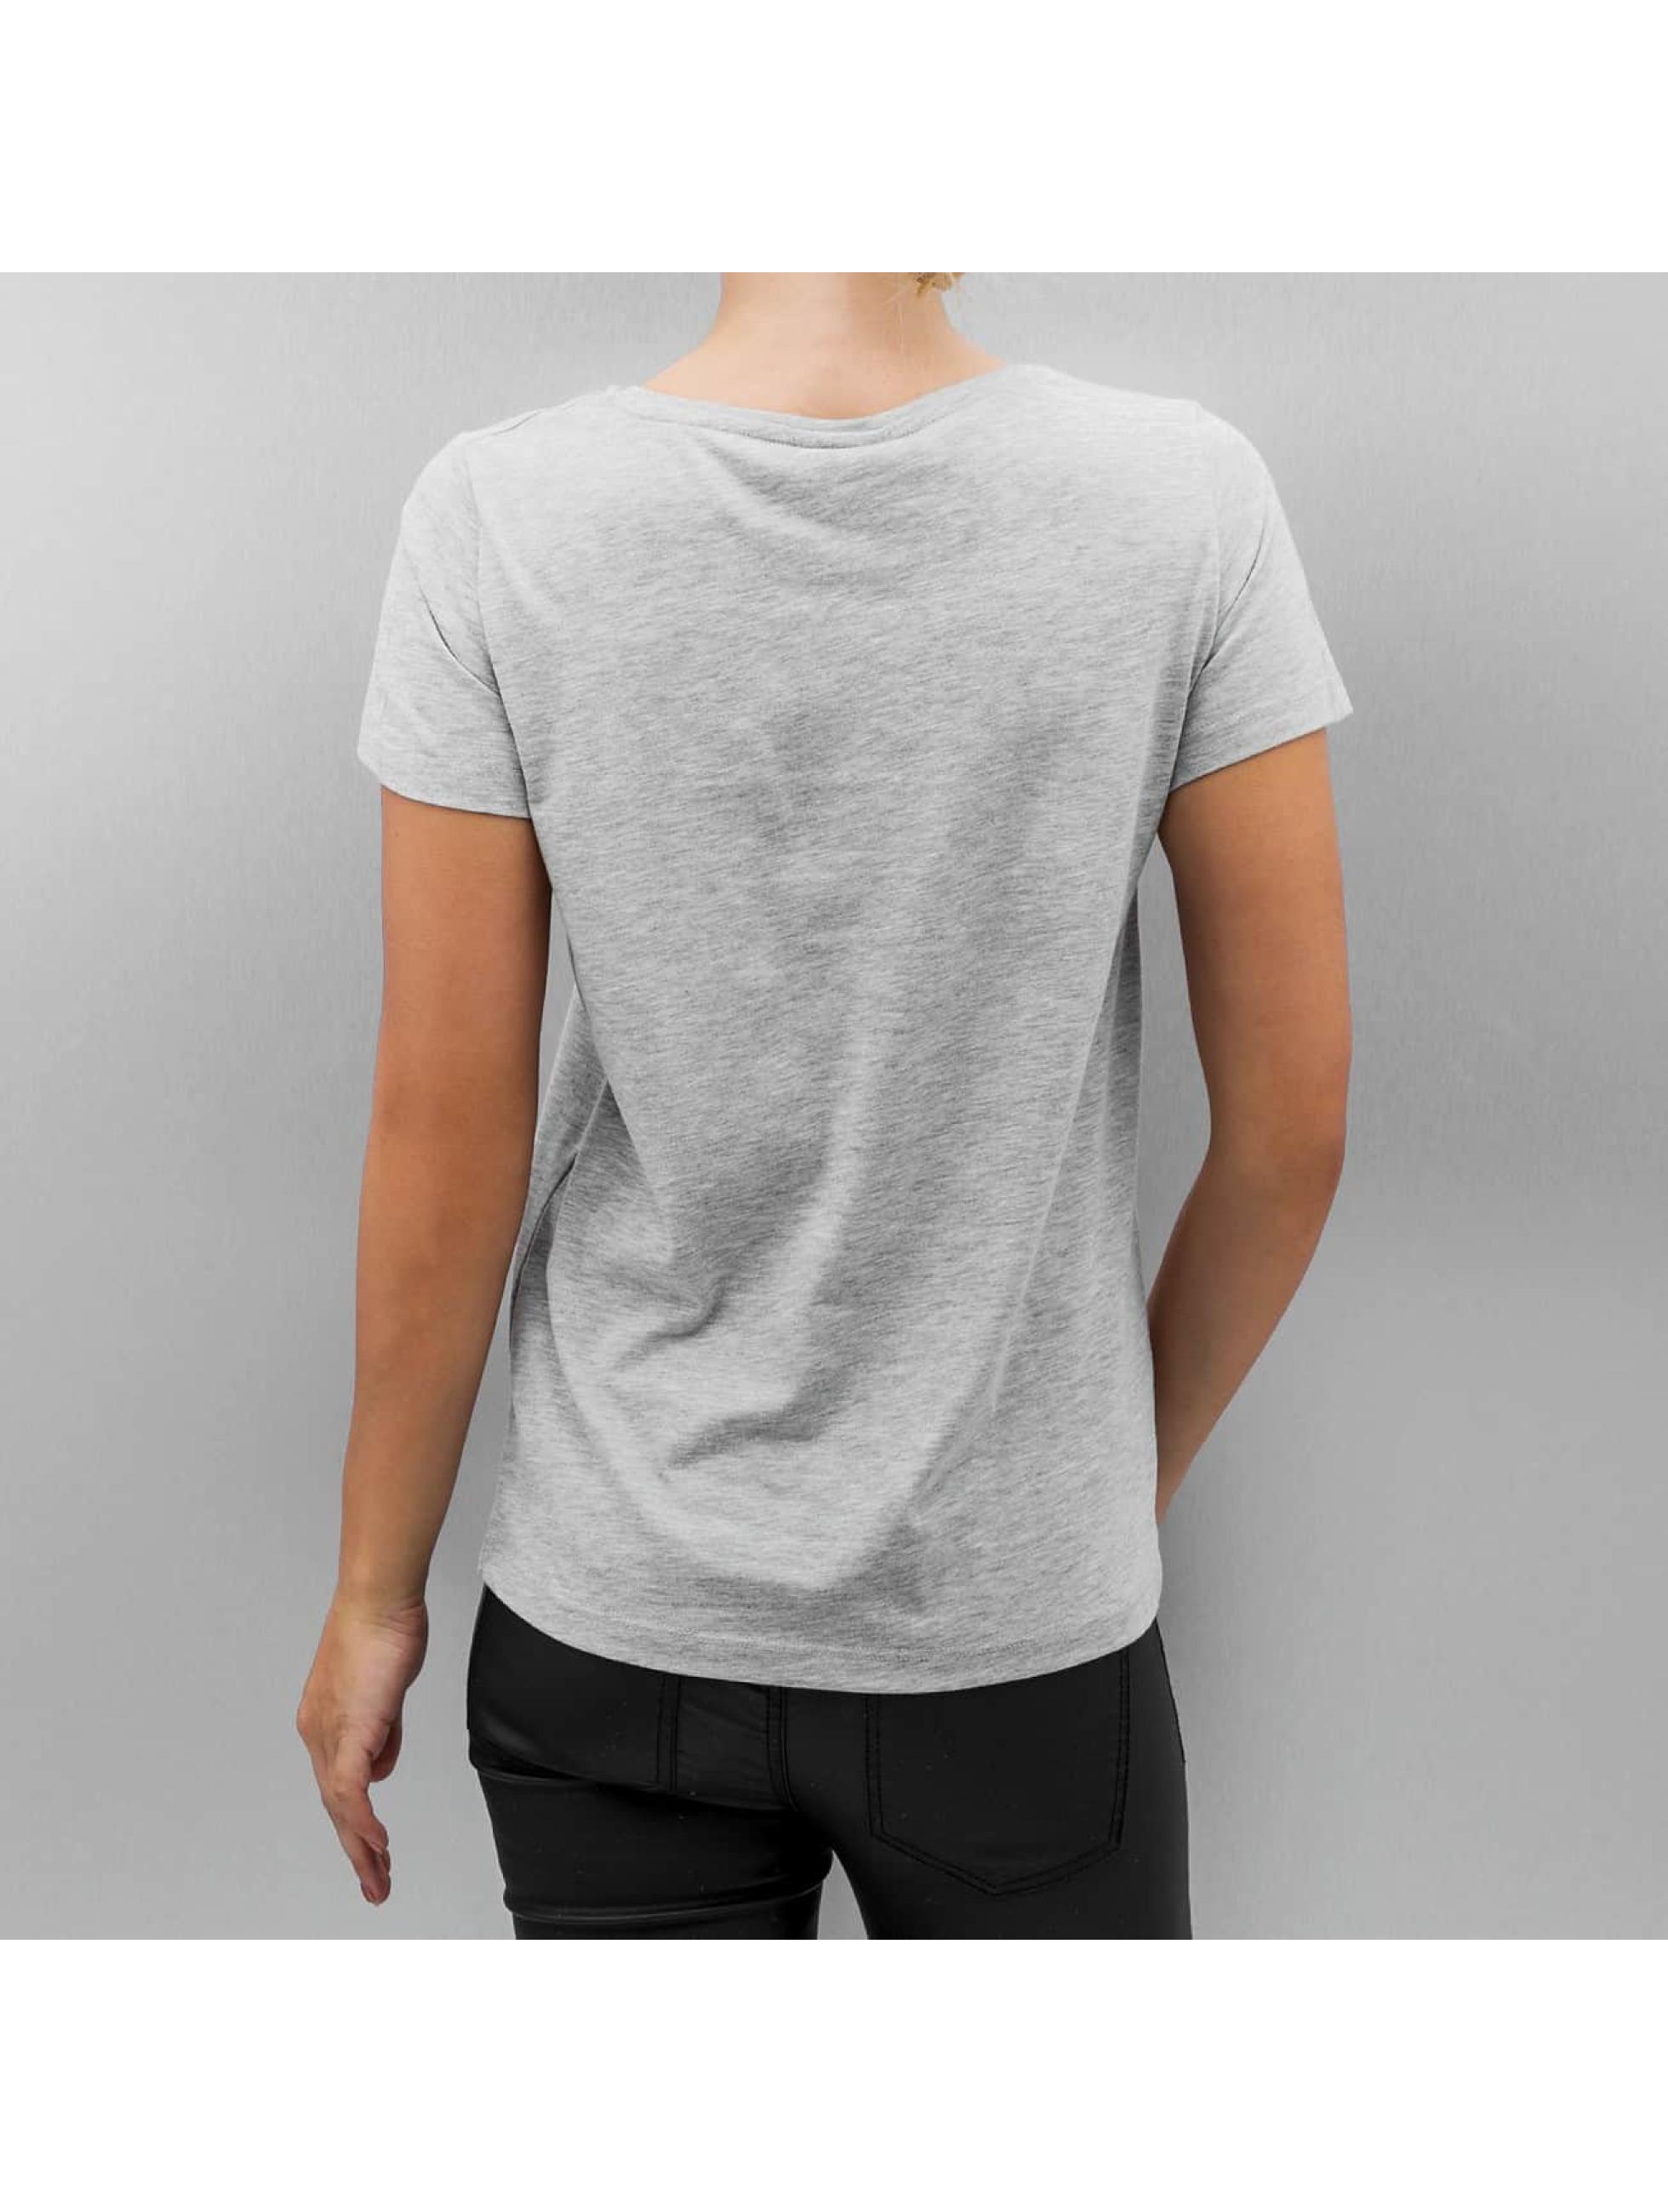 Vero Moda T-Shirt VmMy grey